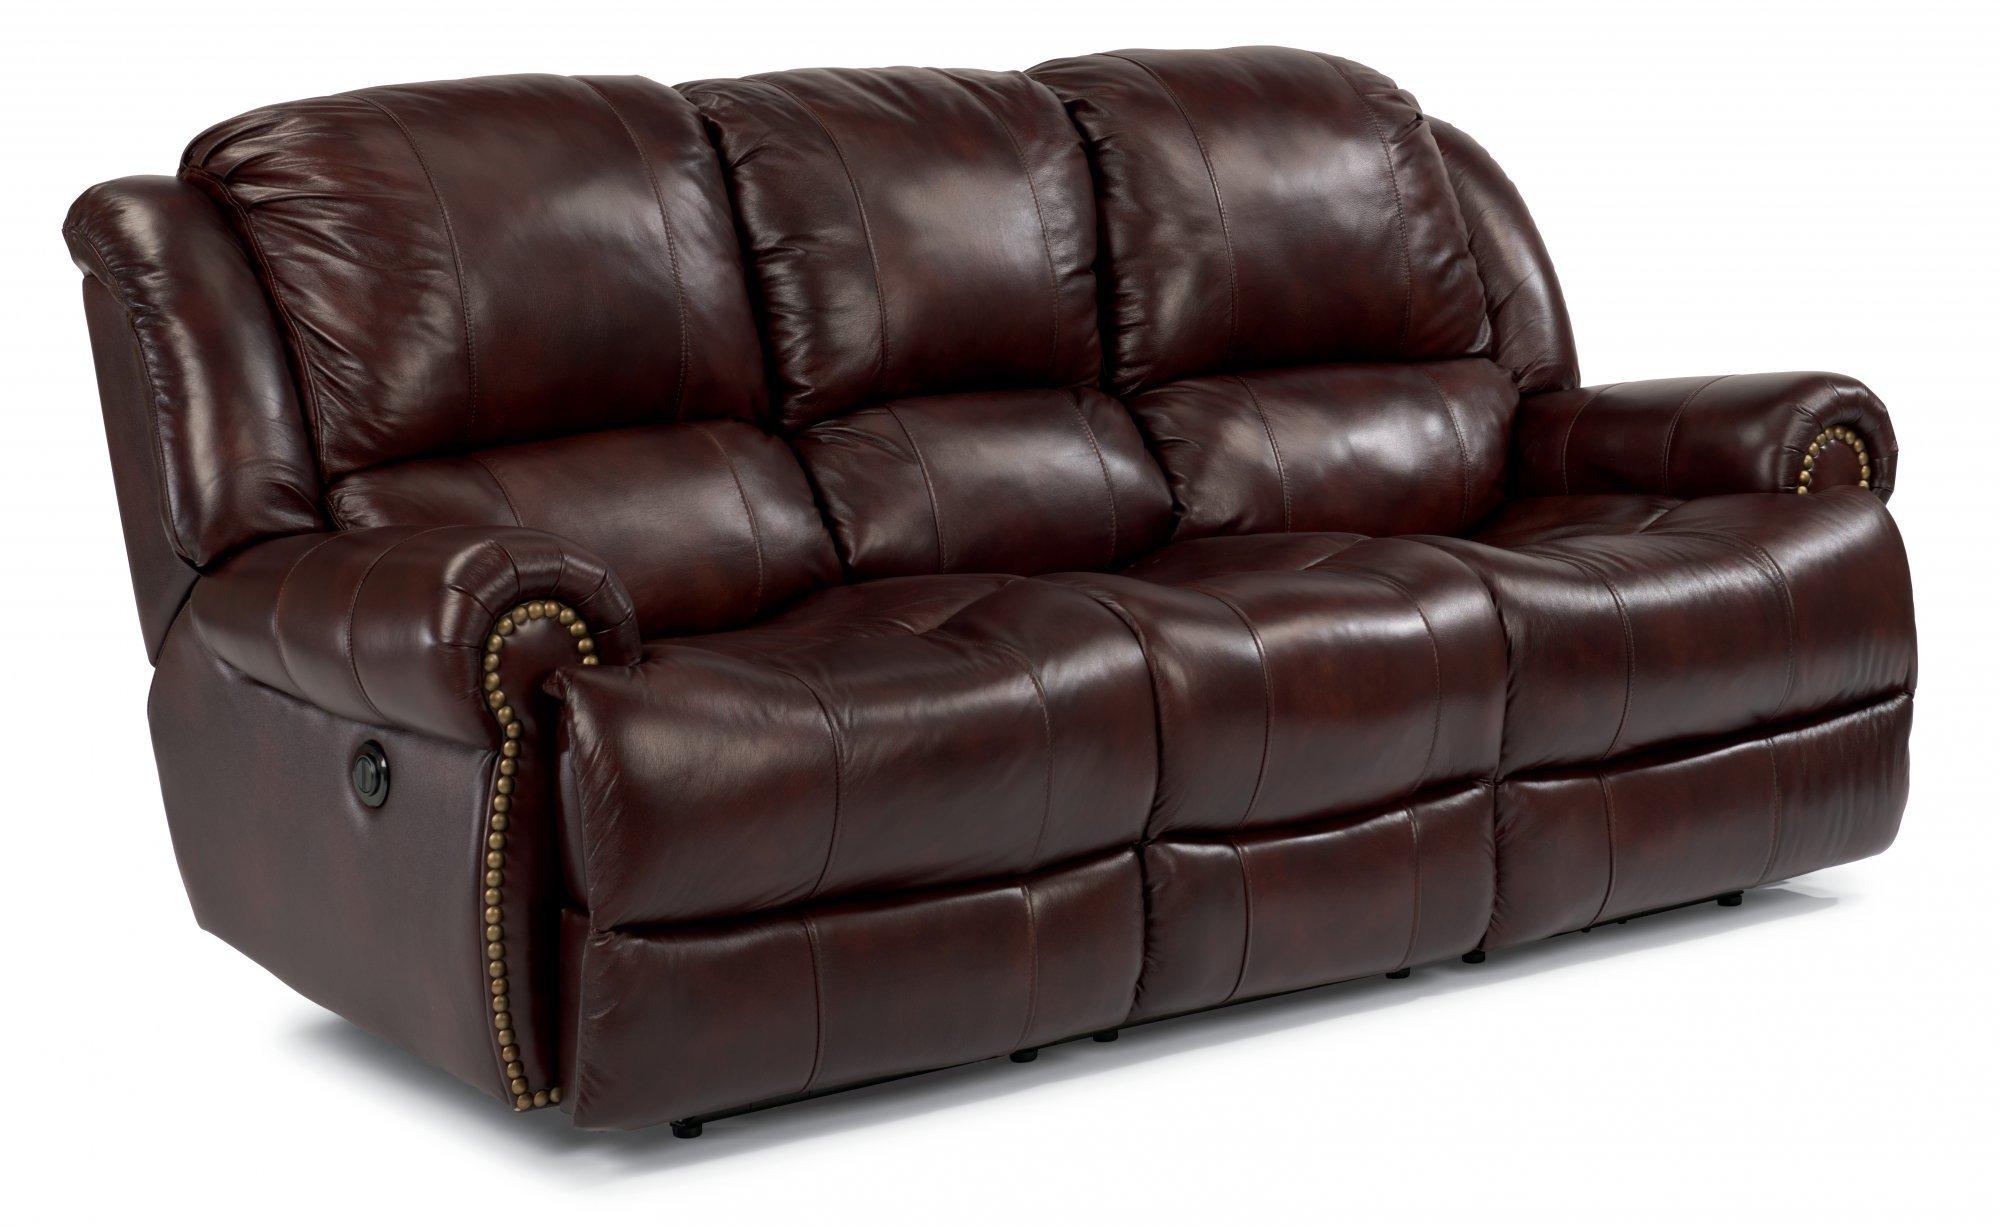 Furniture Store College Station, TX. Rustic Furniture Bryan, TX. Sienna.  Capital